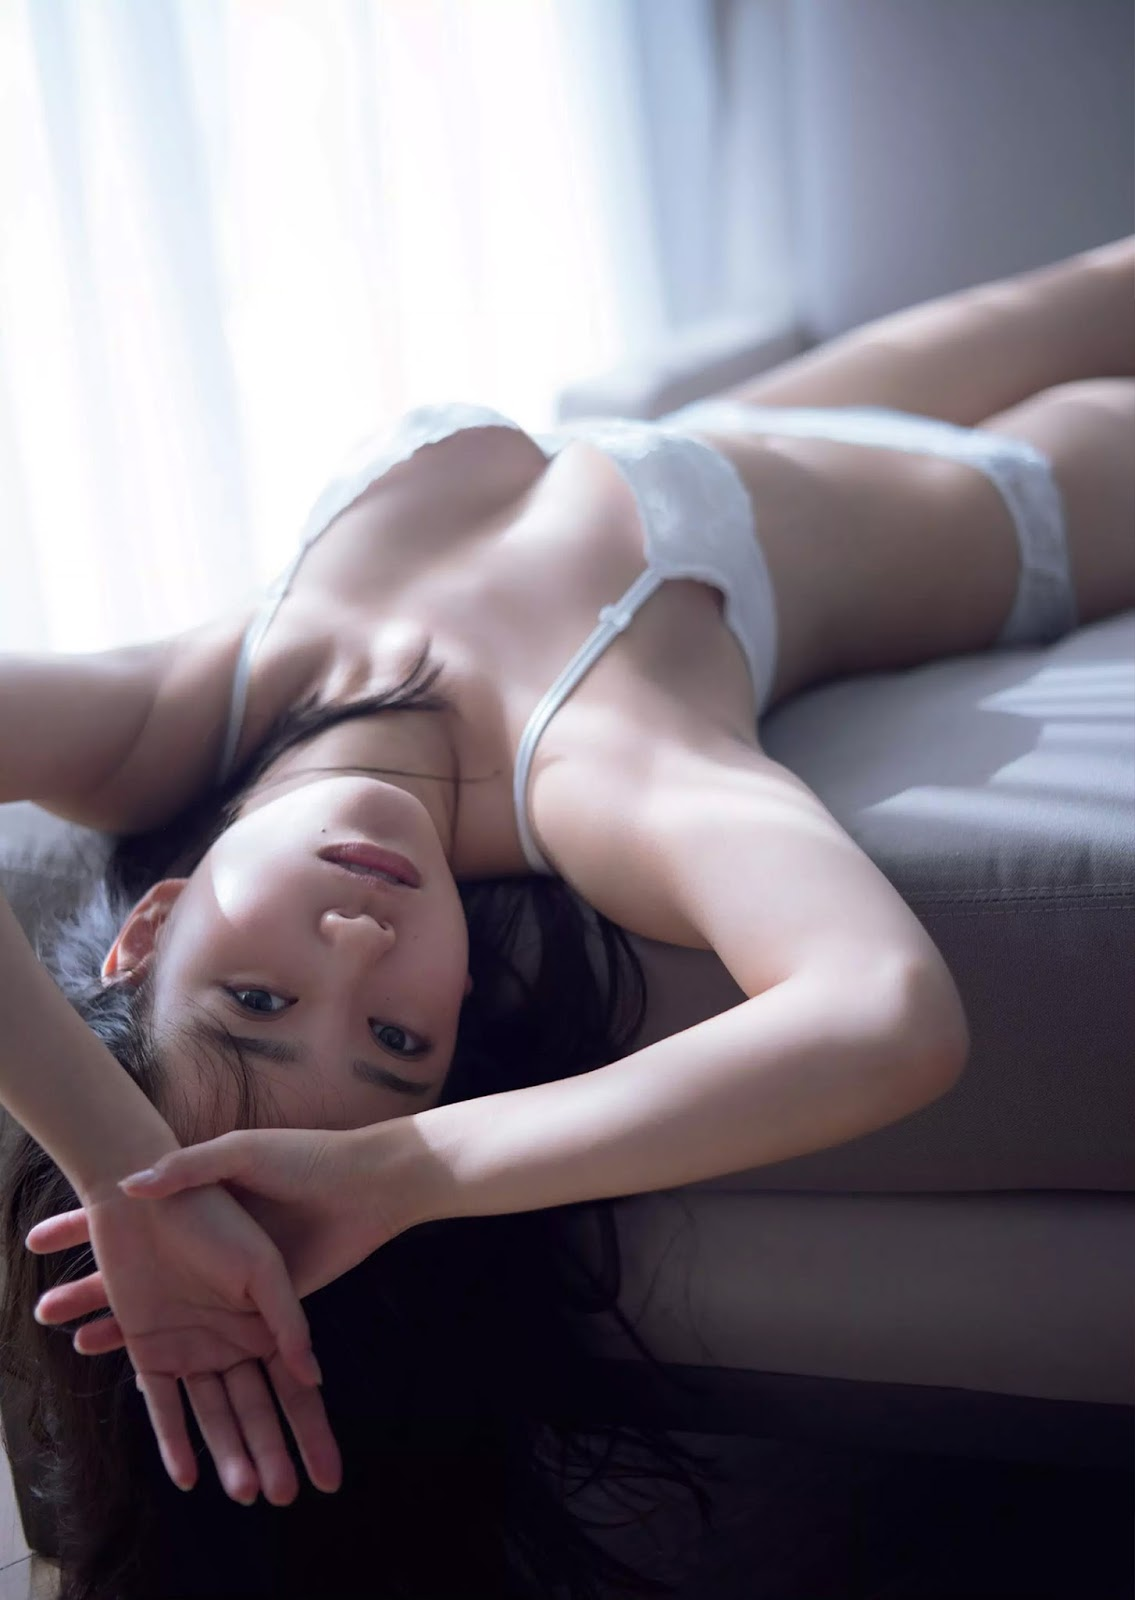 Kato Rena 加藤玲奈, Weekly Playboy 2018 No.15 (週刊プレイボーイ 2018年15号)